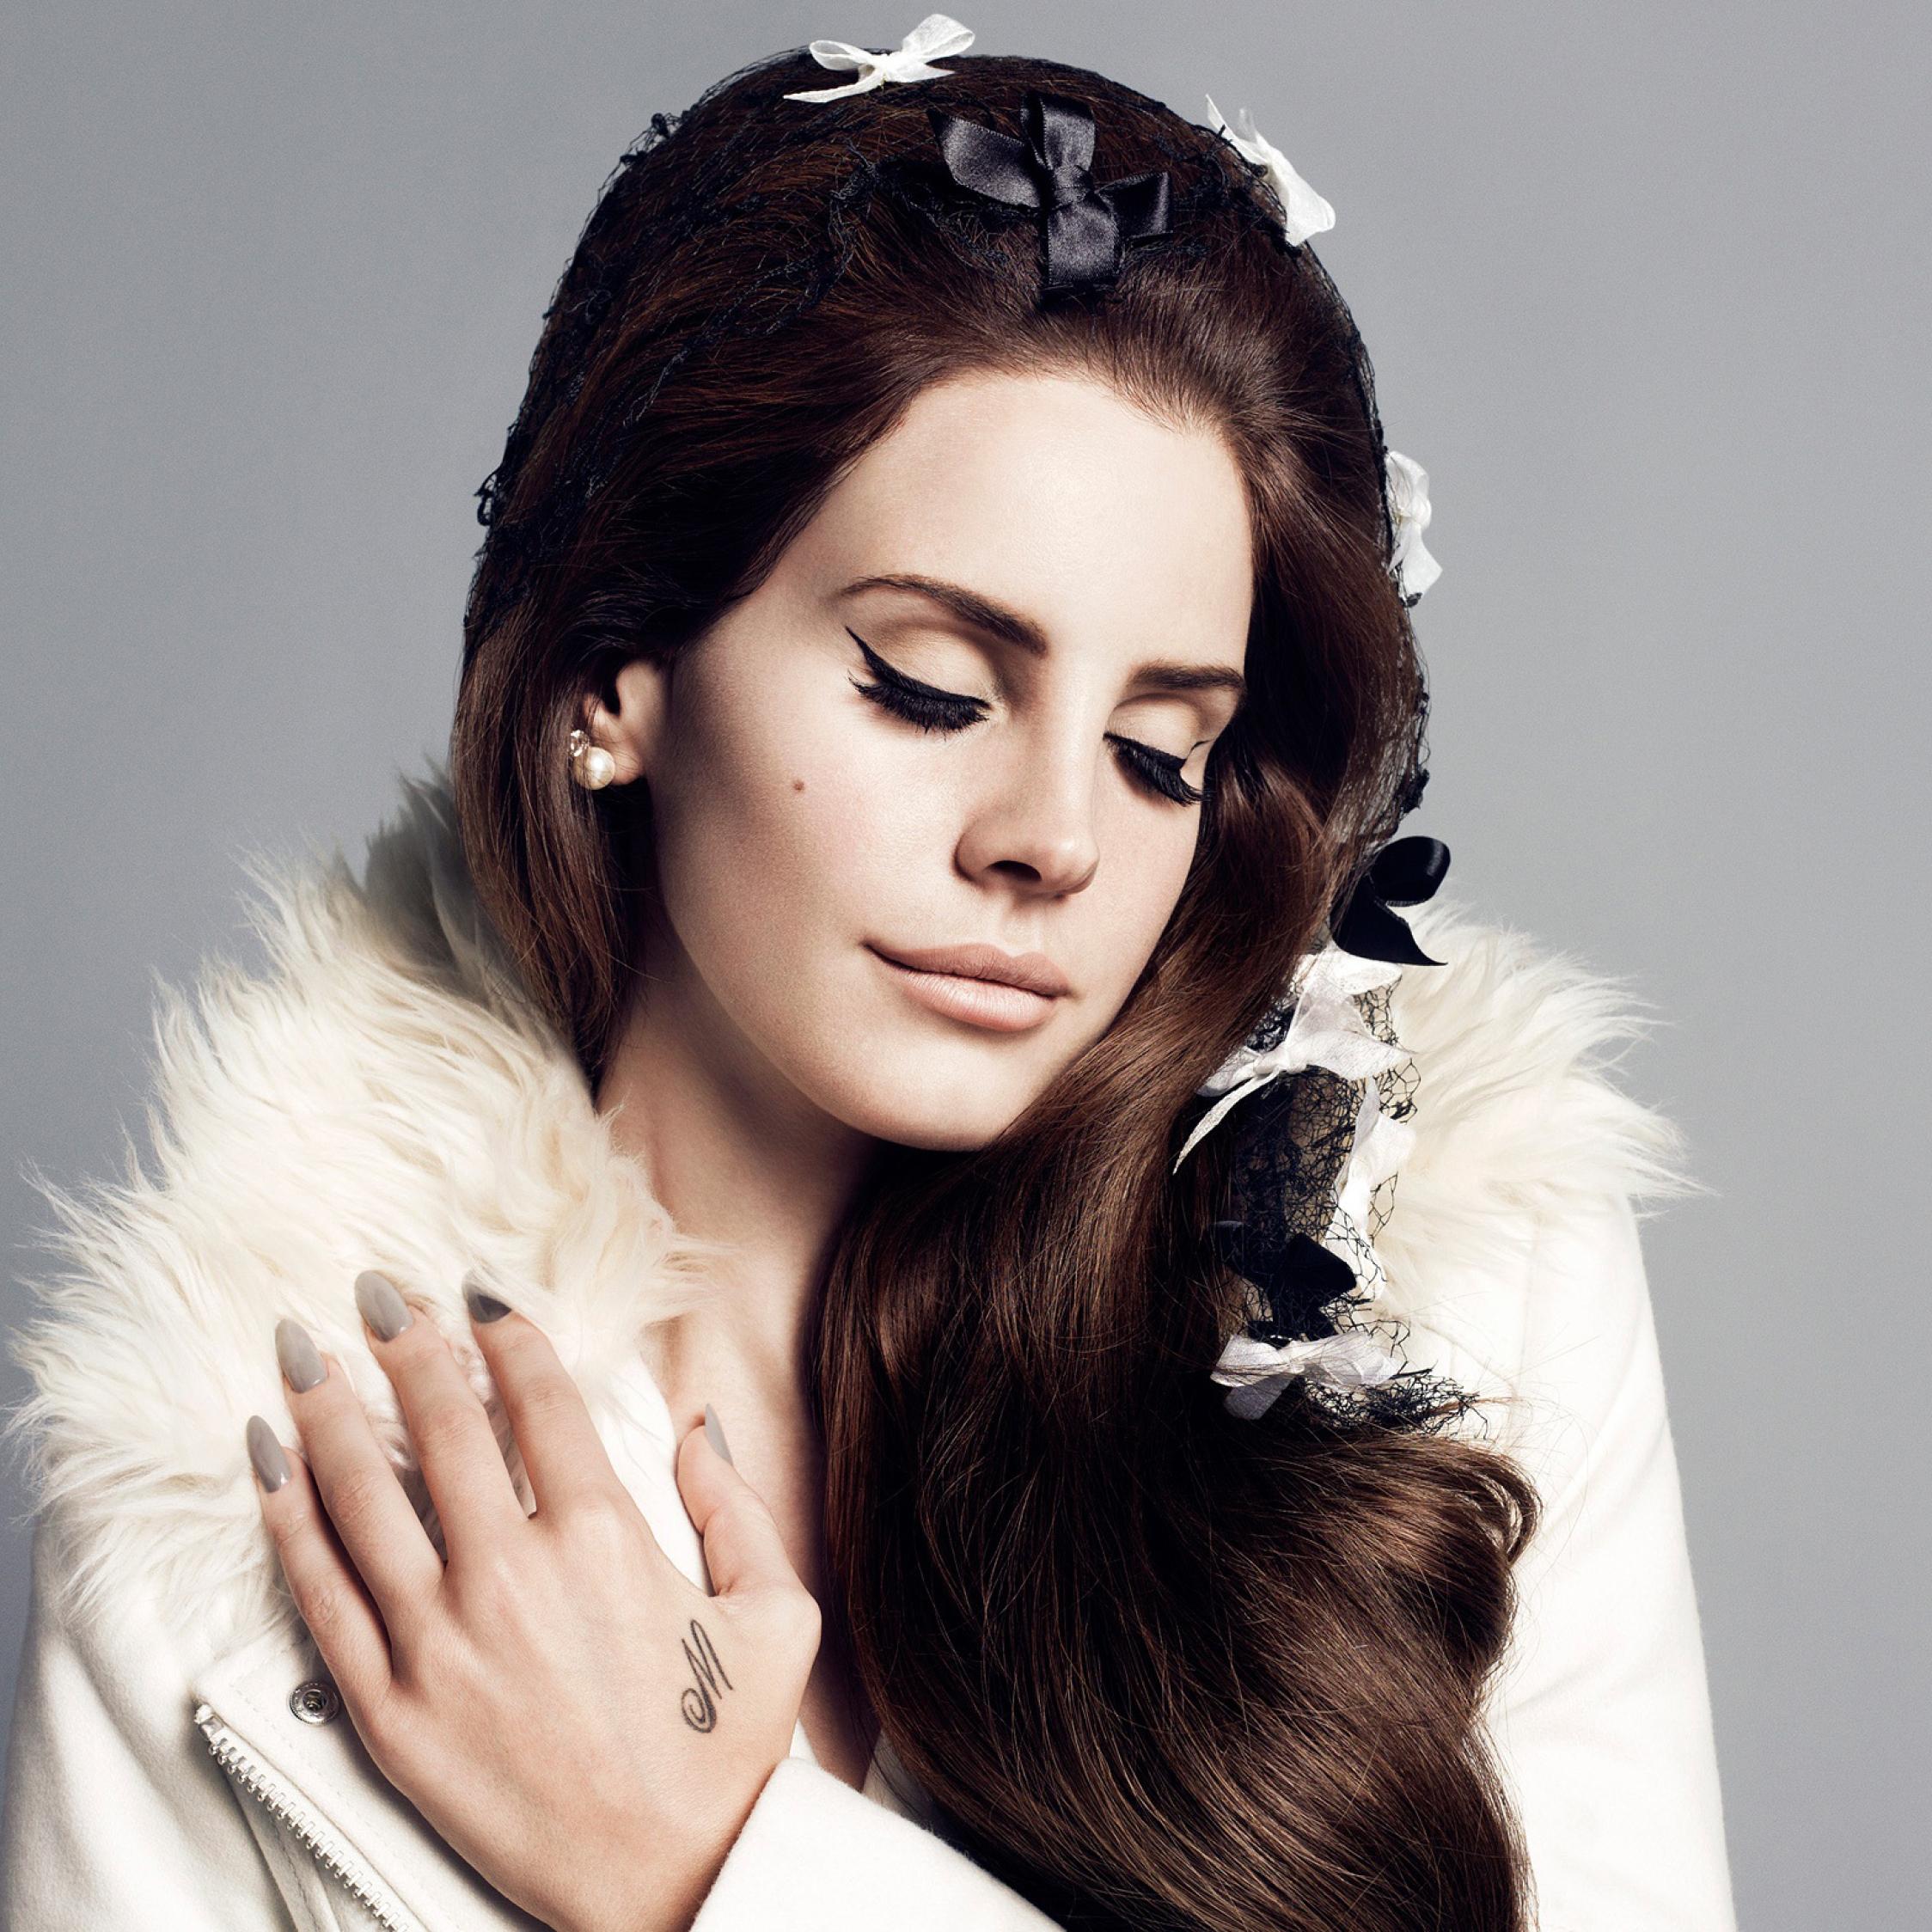 2248x2248 Lana Del Rey Portrait Wallpapers 2248x2248 Resolution